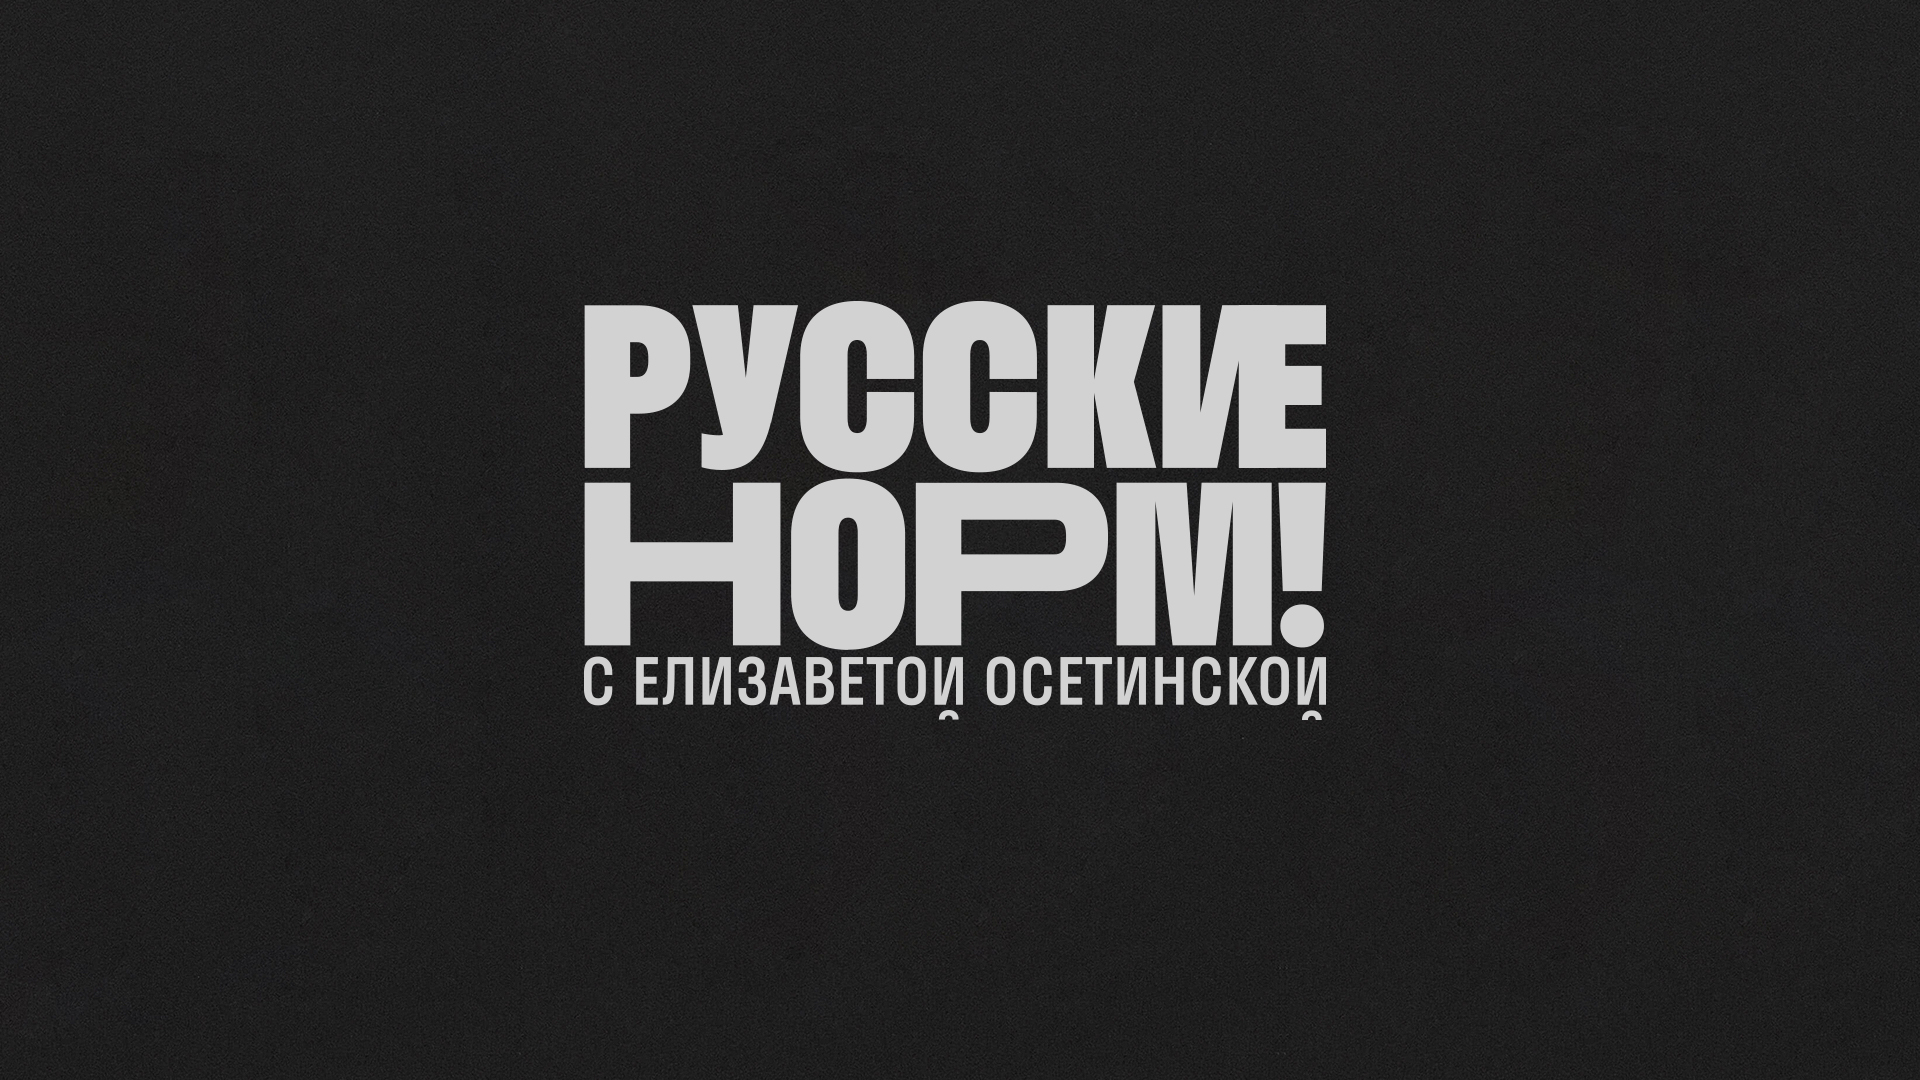 http://amp.gs/UC7k